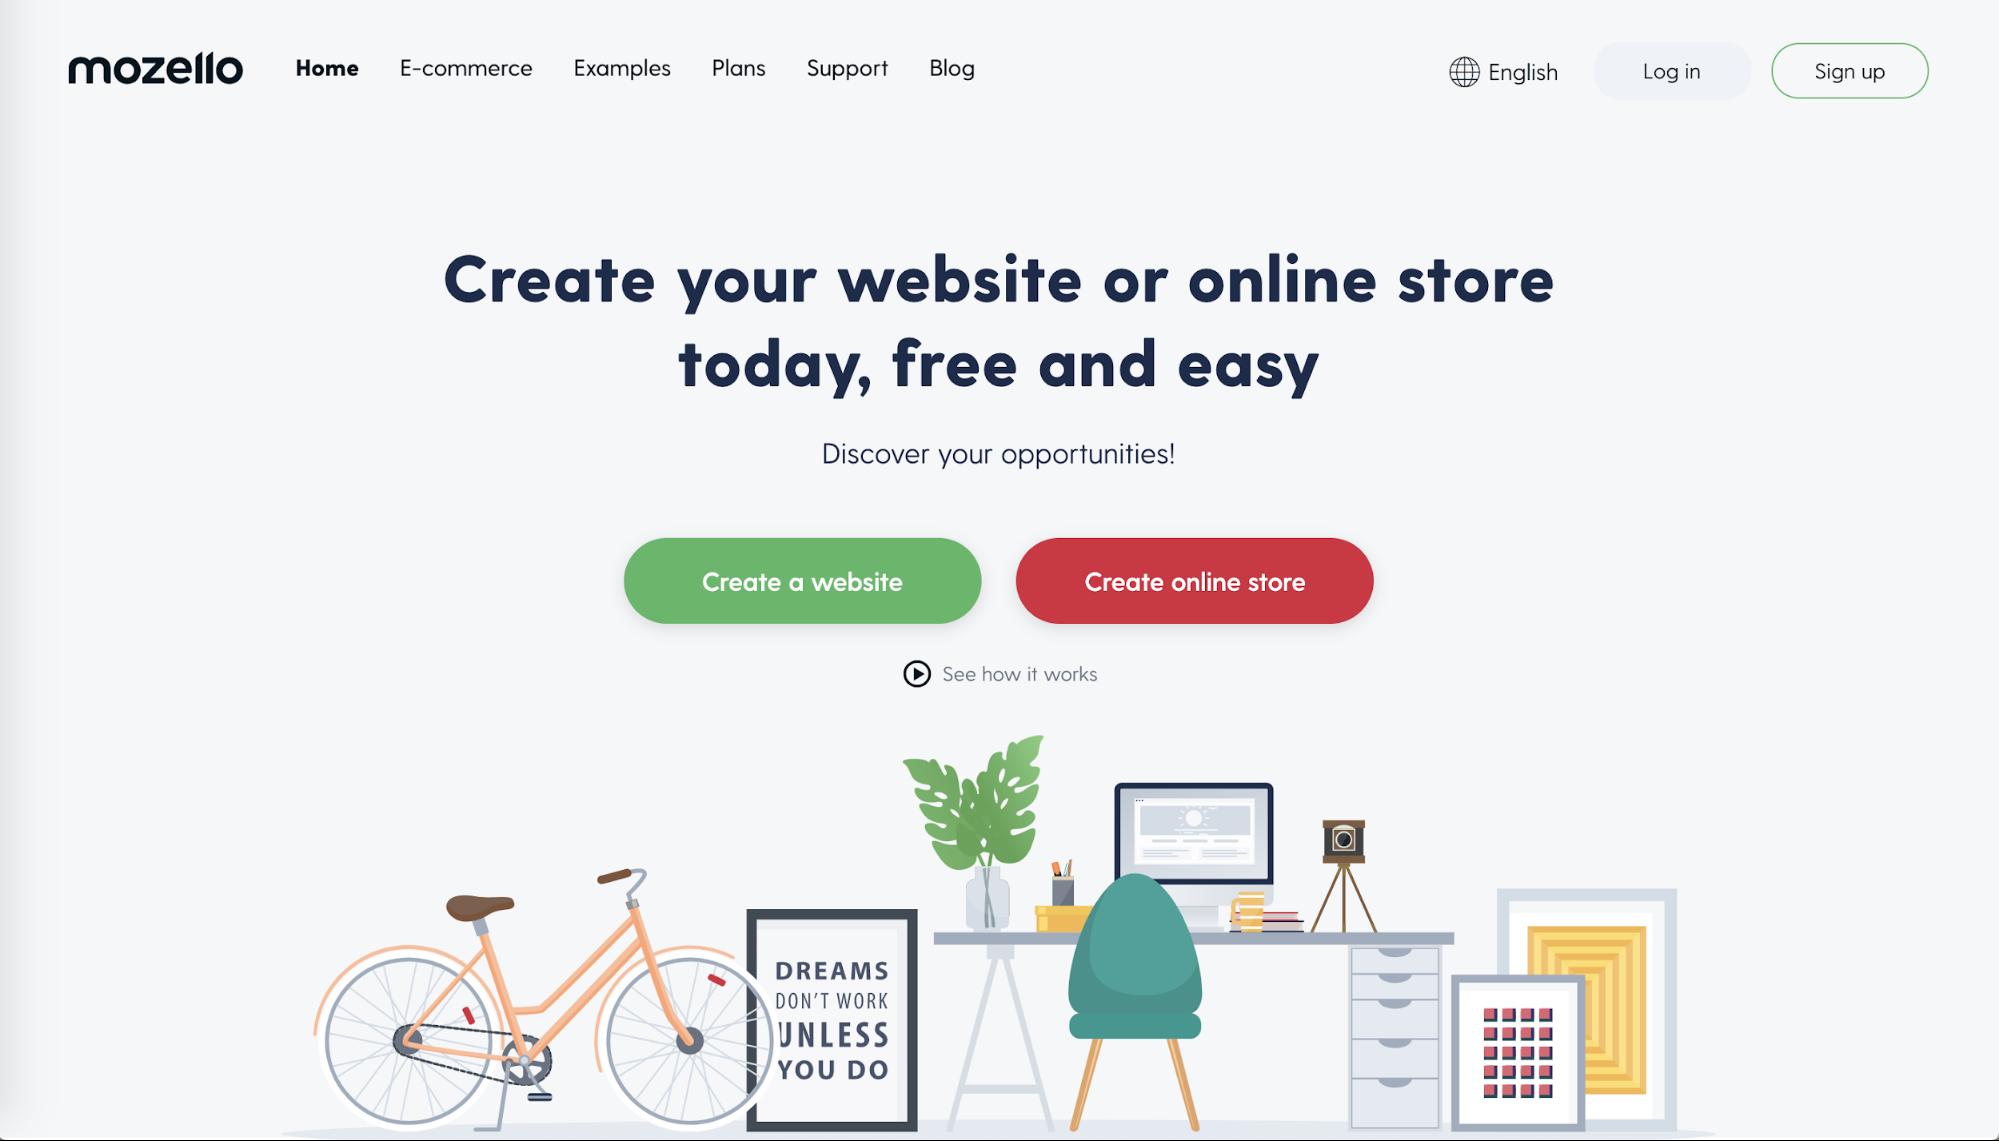 Mozello website